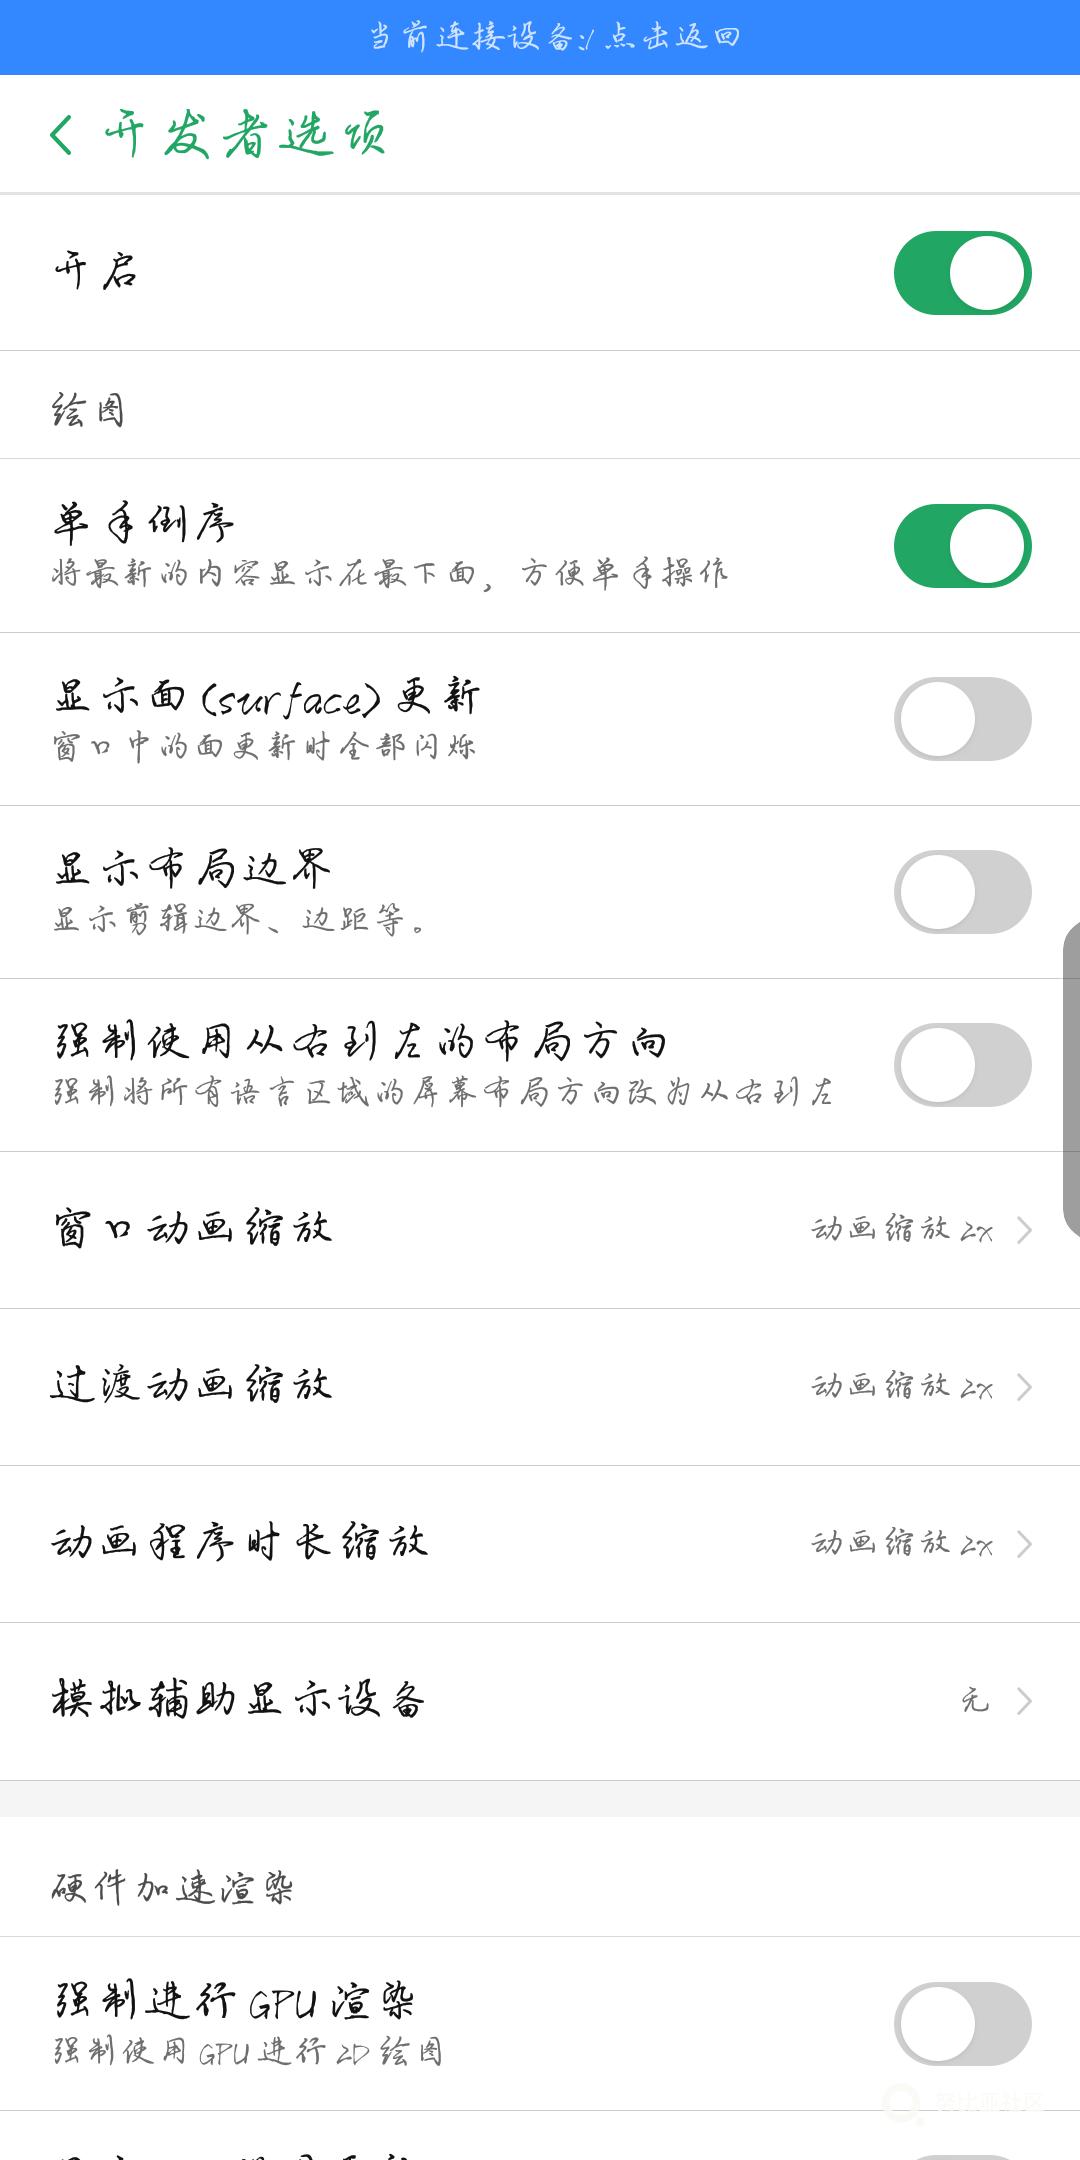 Screenshot_2018-05-02-21-11-25.png